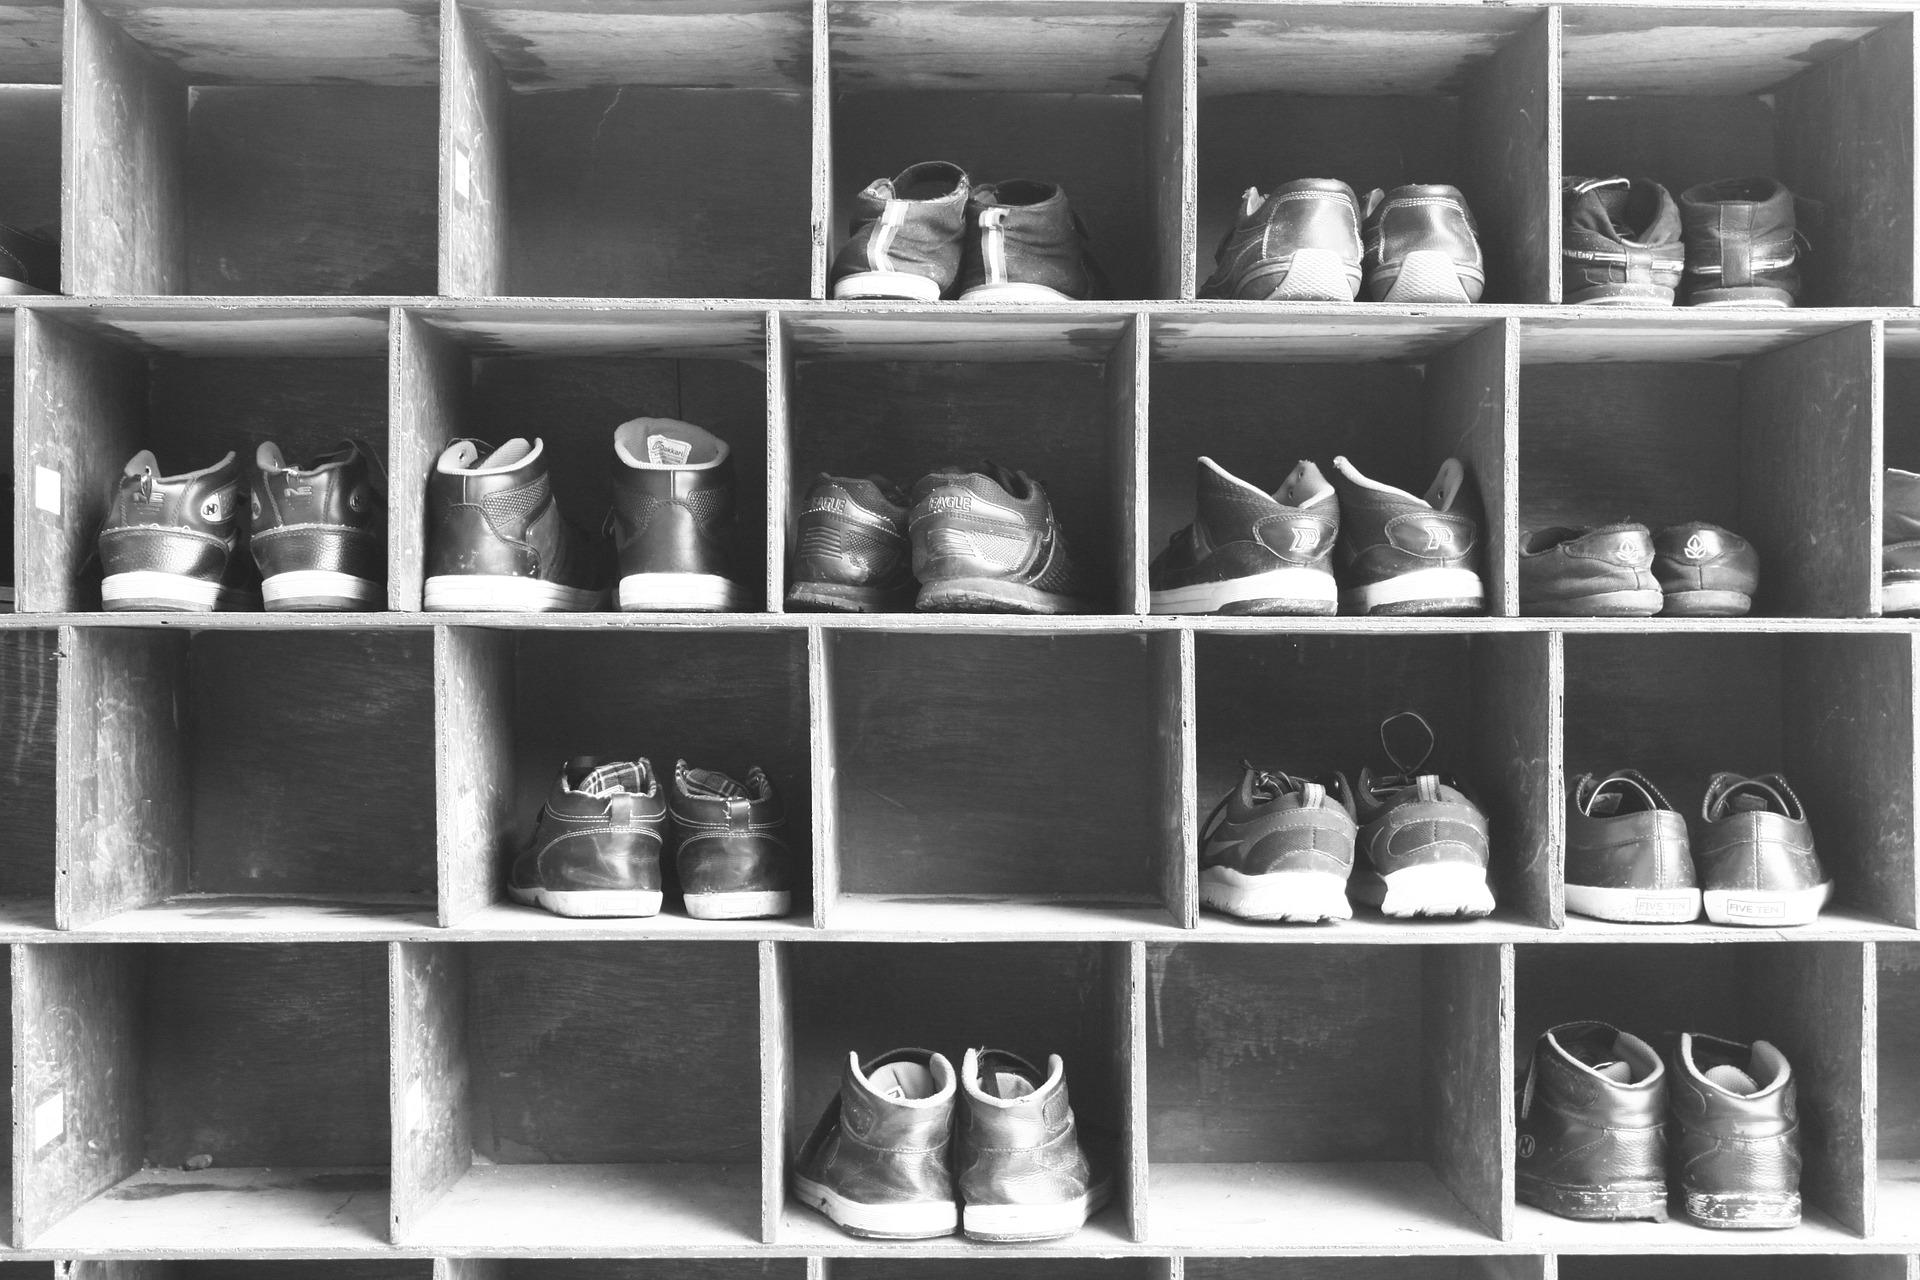 shoe-1099446_1920